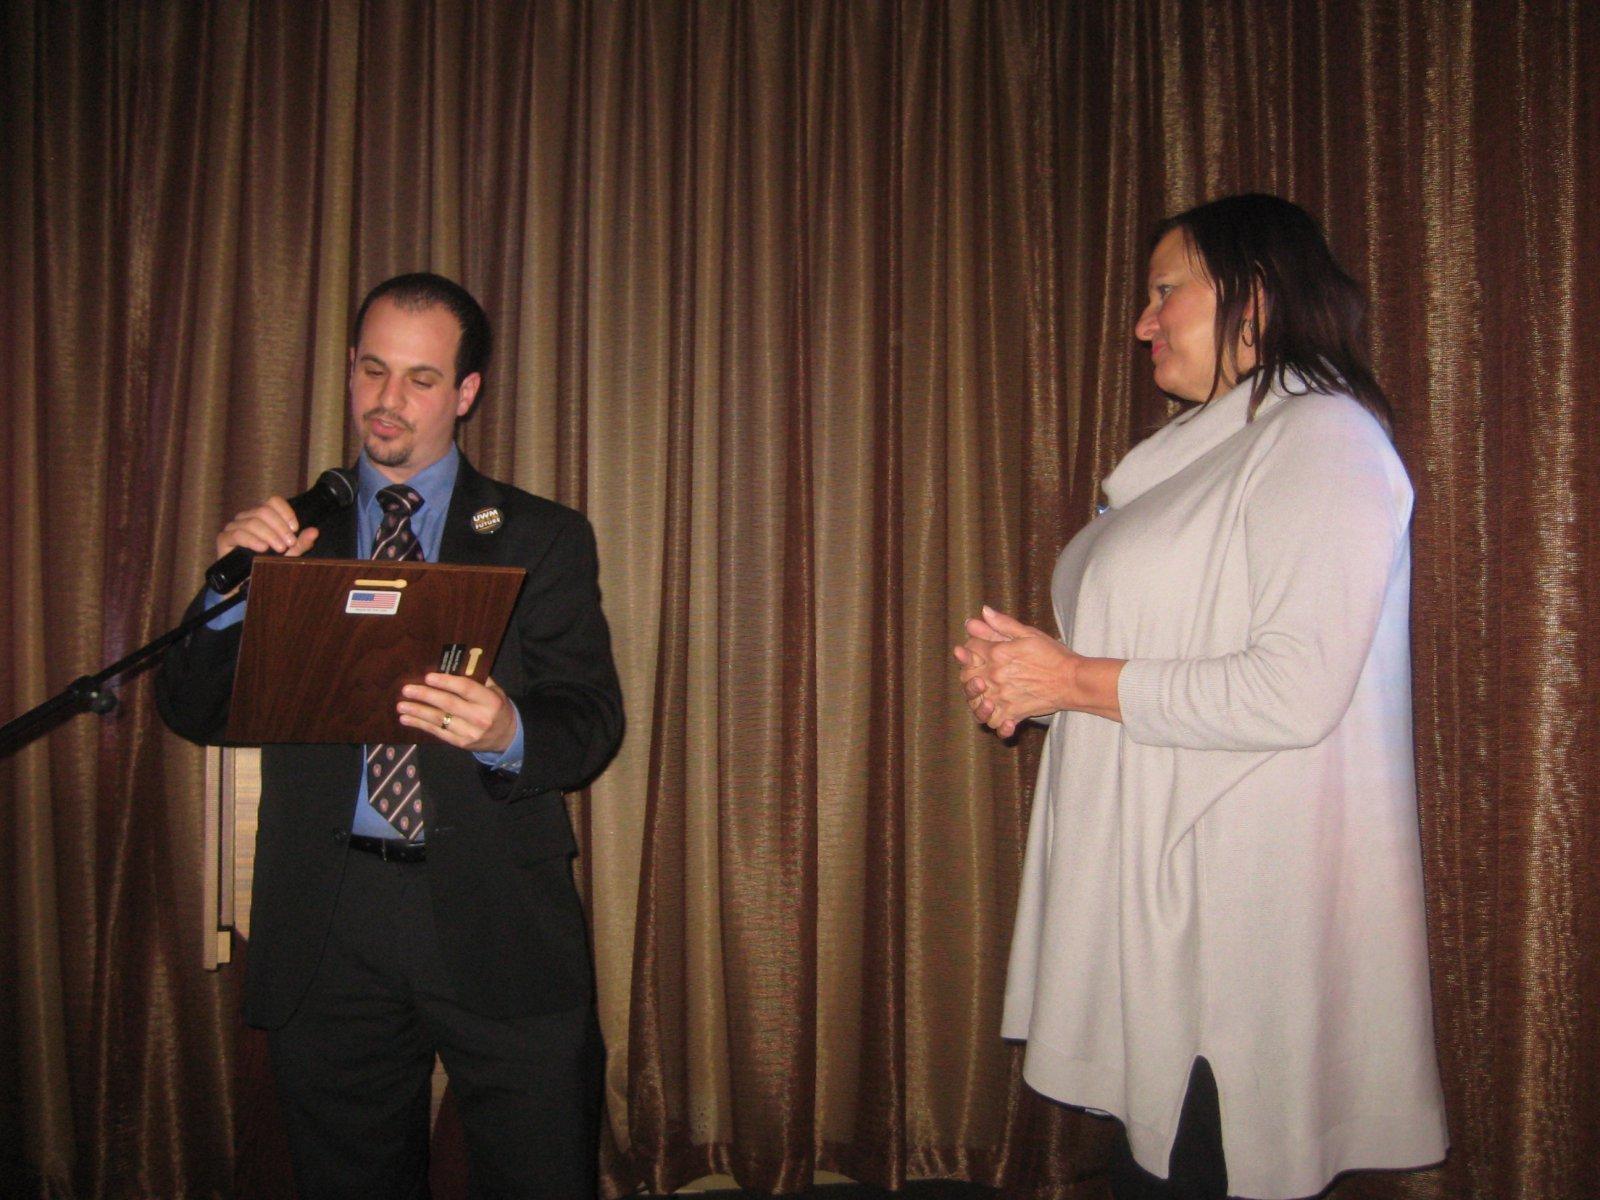 Jonathan Brostoff and Patti Keating Kahn